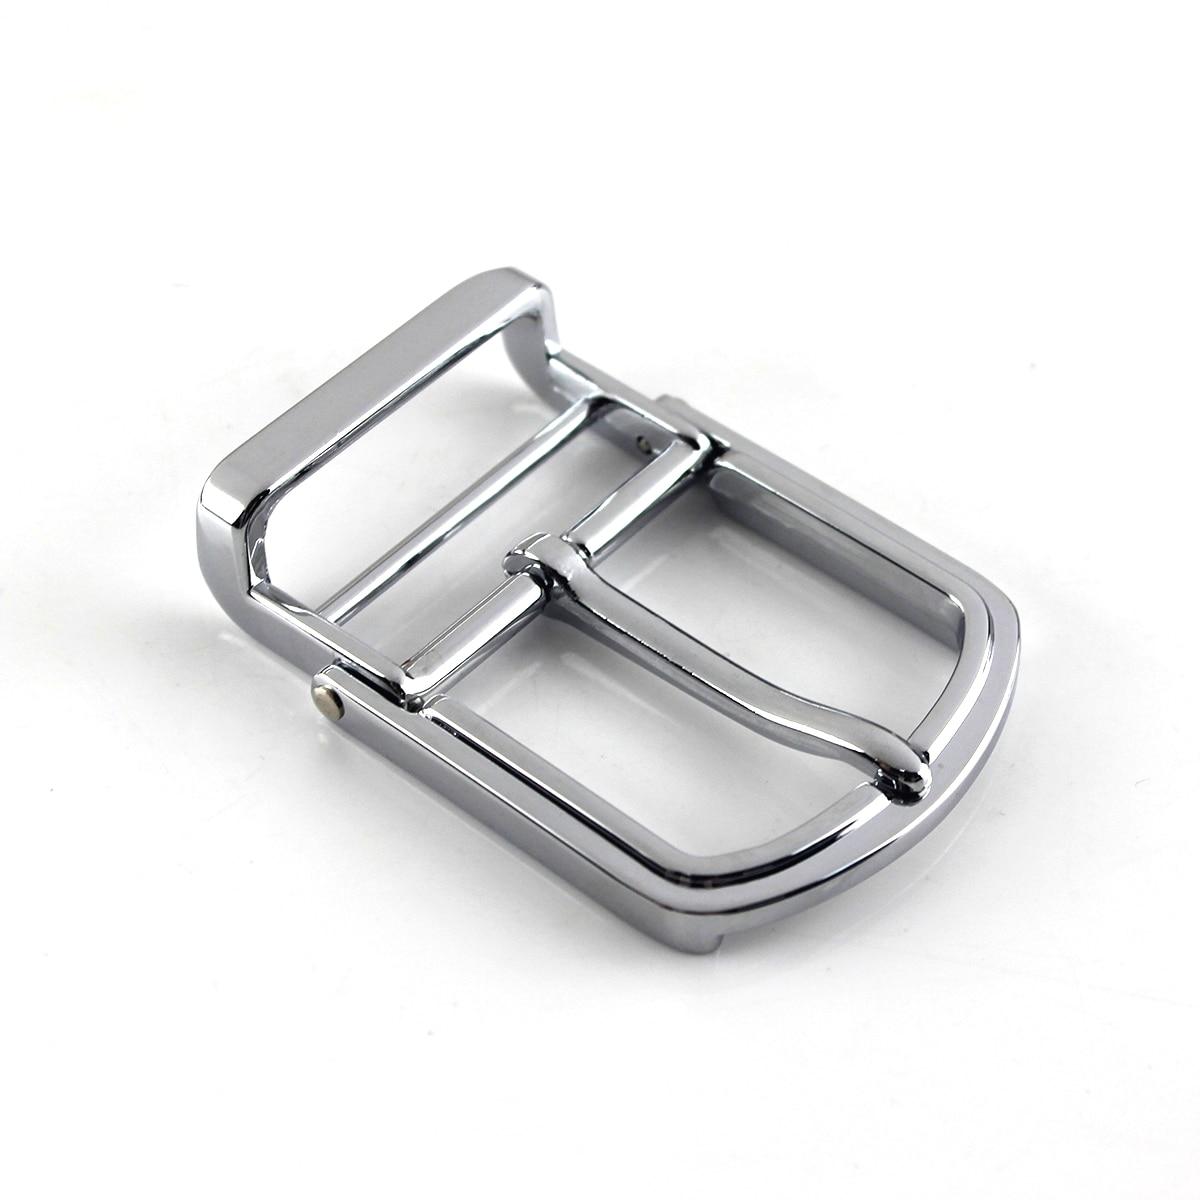 1pcs 35mm Metal Men/ Women's Belt Buckle Chrome Clip Buckle Rotatable Bottom Single Pin Half Buckle Leather Craft Belt Strap